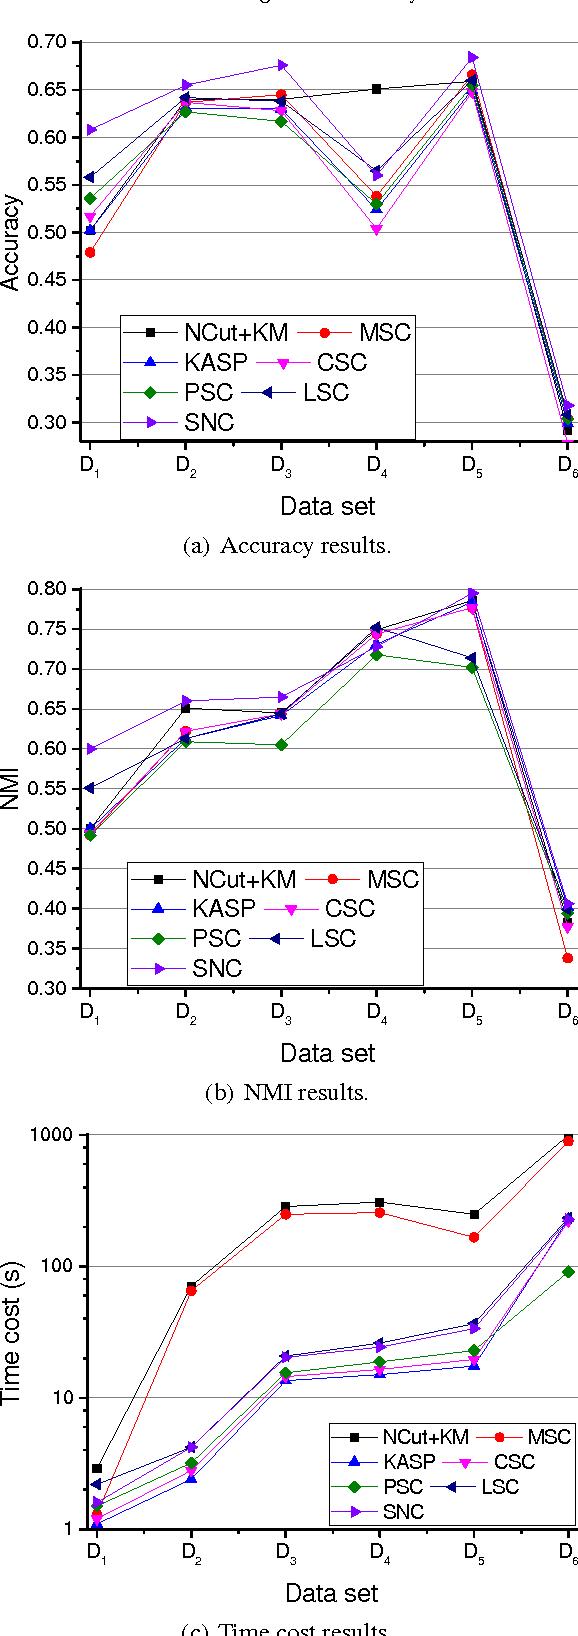 Figure 3: Comparison results of seven clustering algorithms on six data sets.